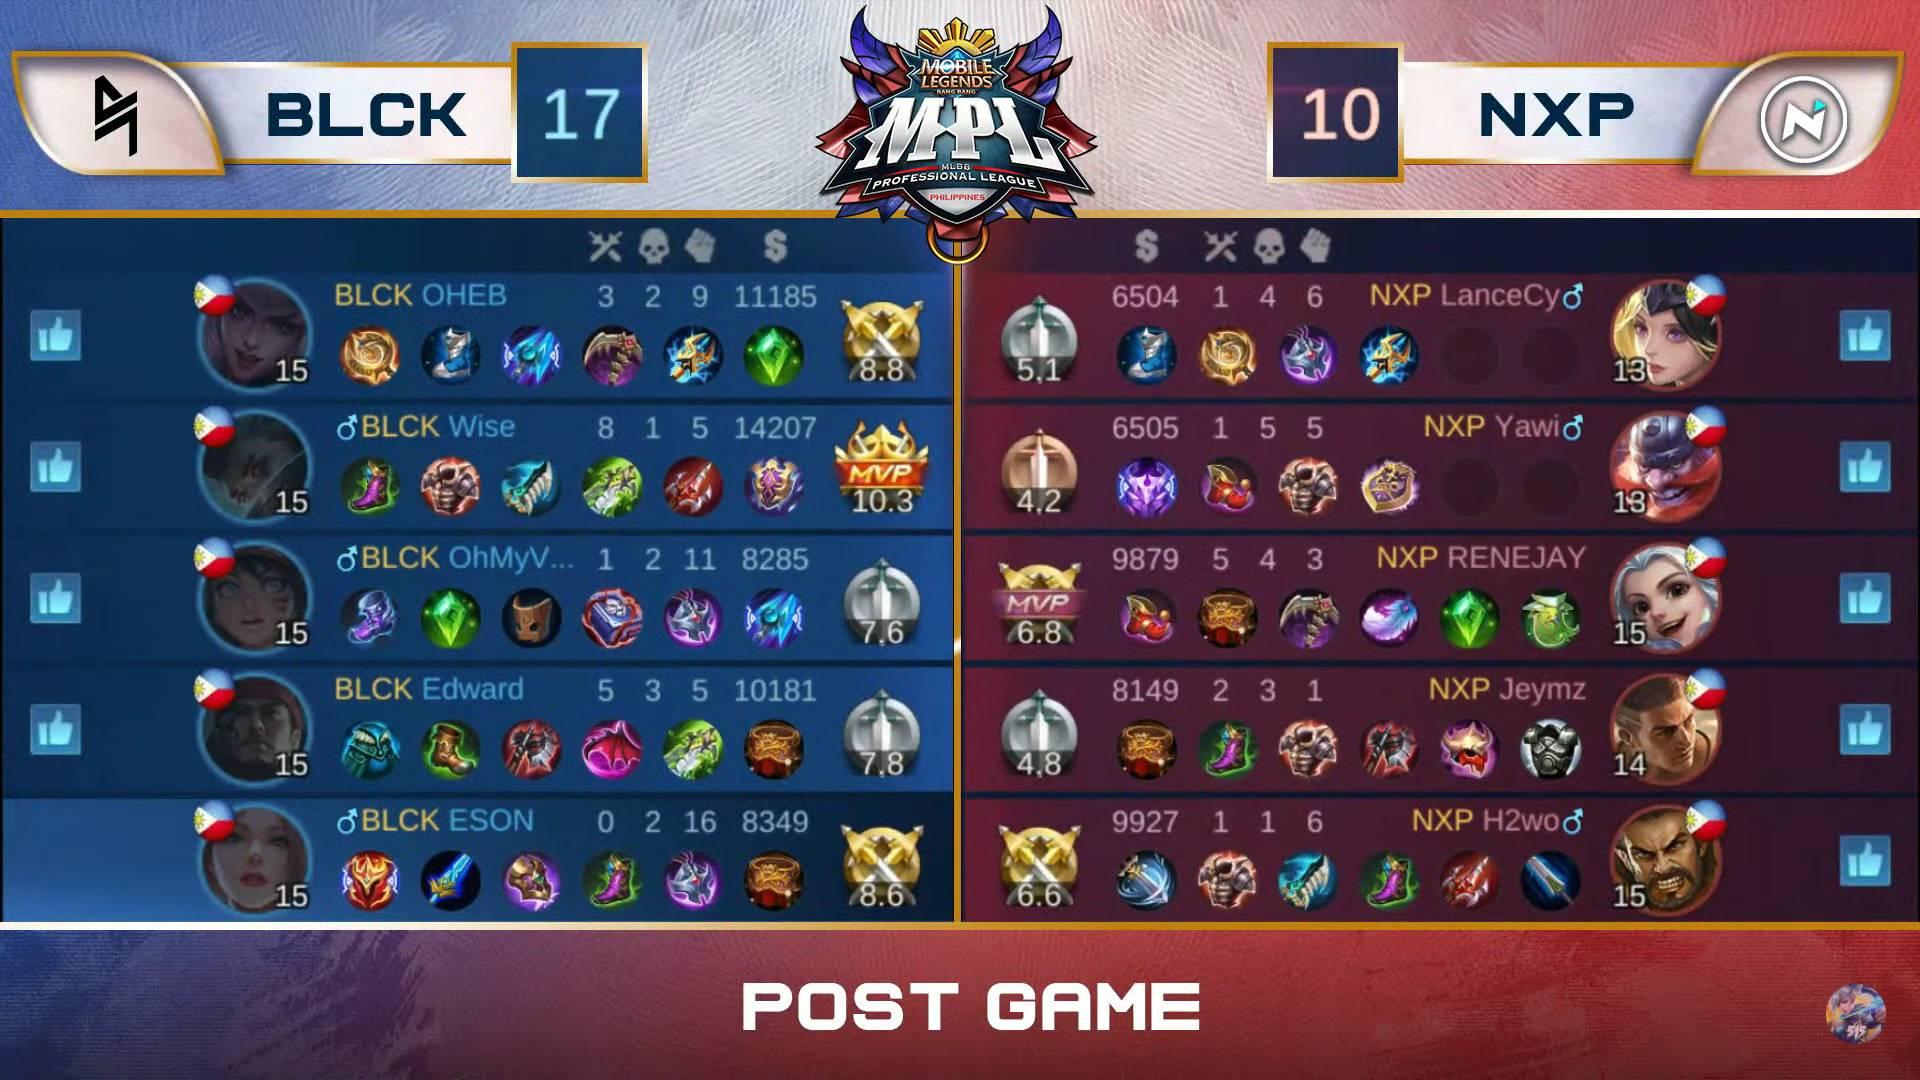 MPL-PH-7-Blacklist-def-NXP-Game-1 OHEB shines bright as Blacklist makes short work of Nexplay in MPL-PH ESports Mobile Legends MPL-PH News  - philippine sports news